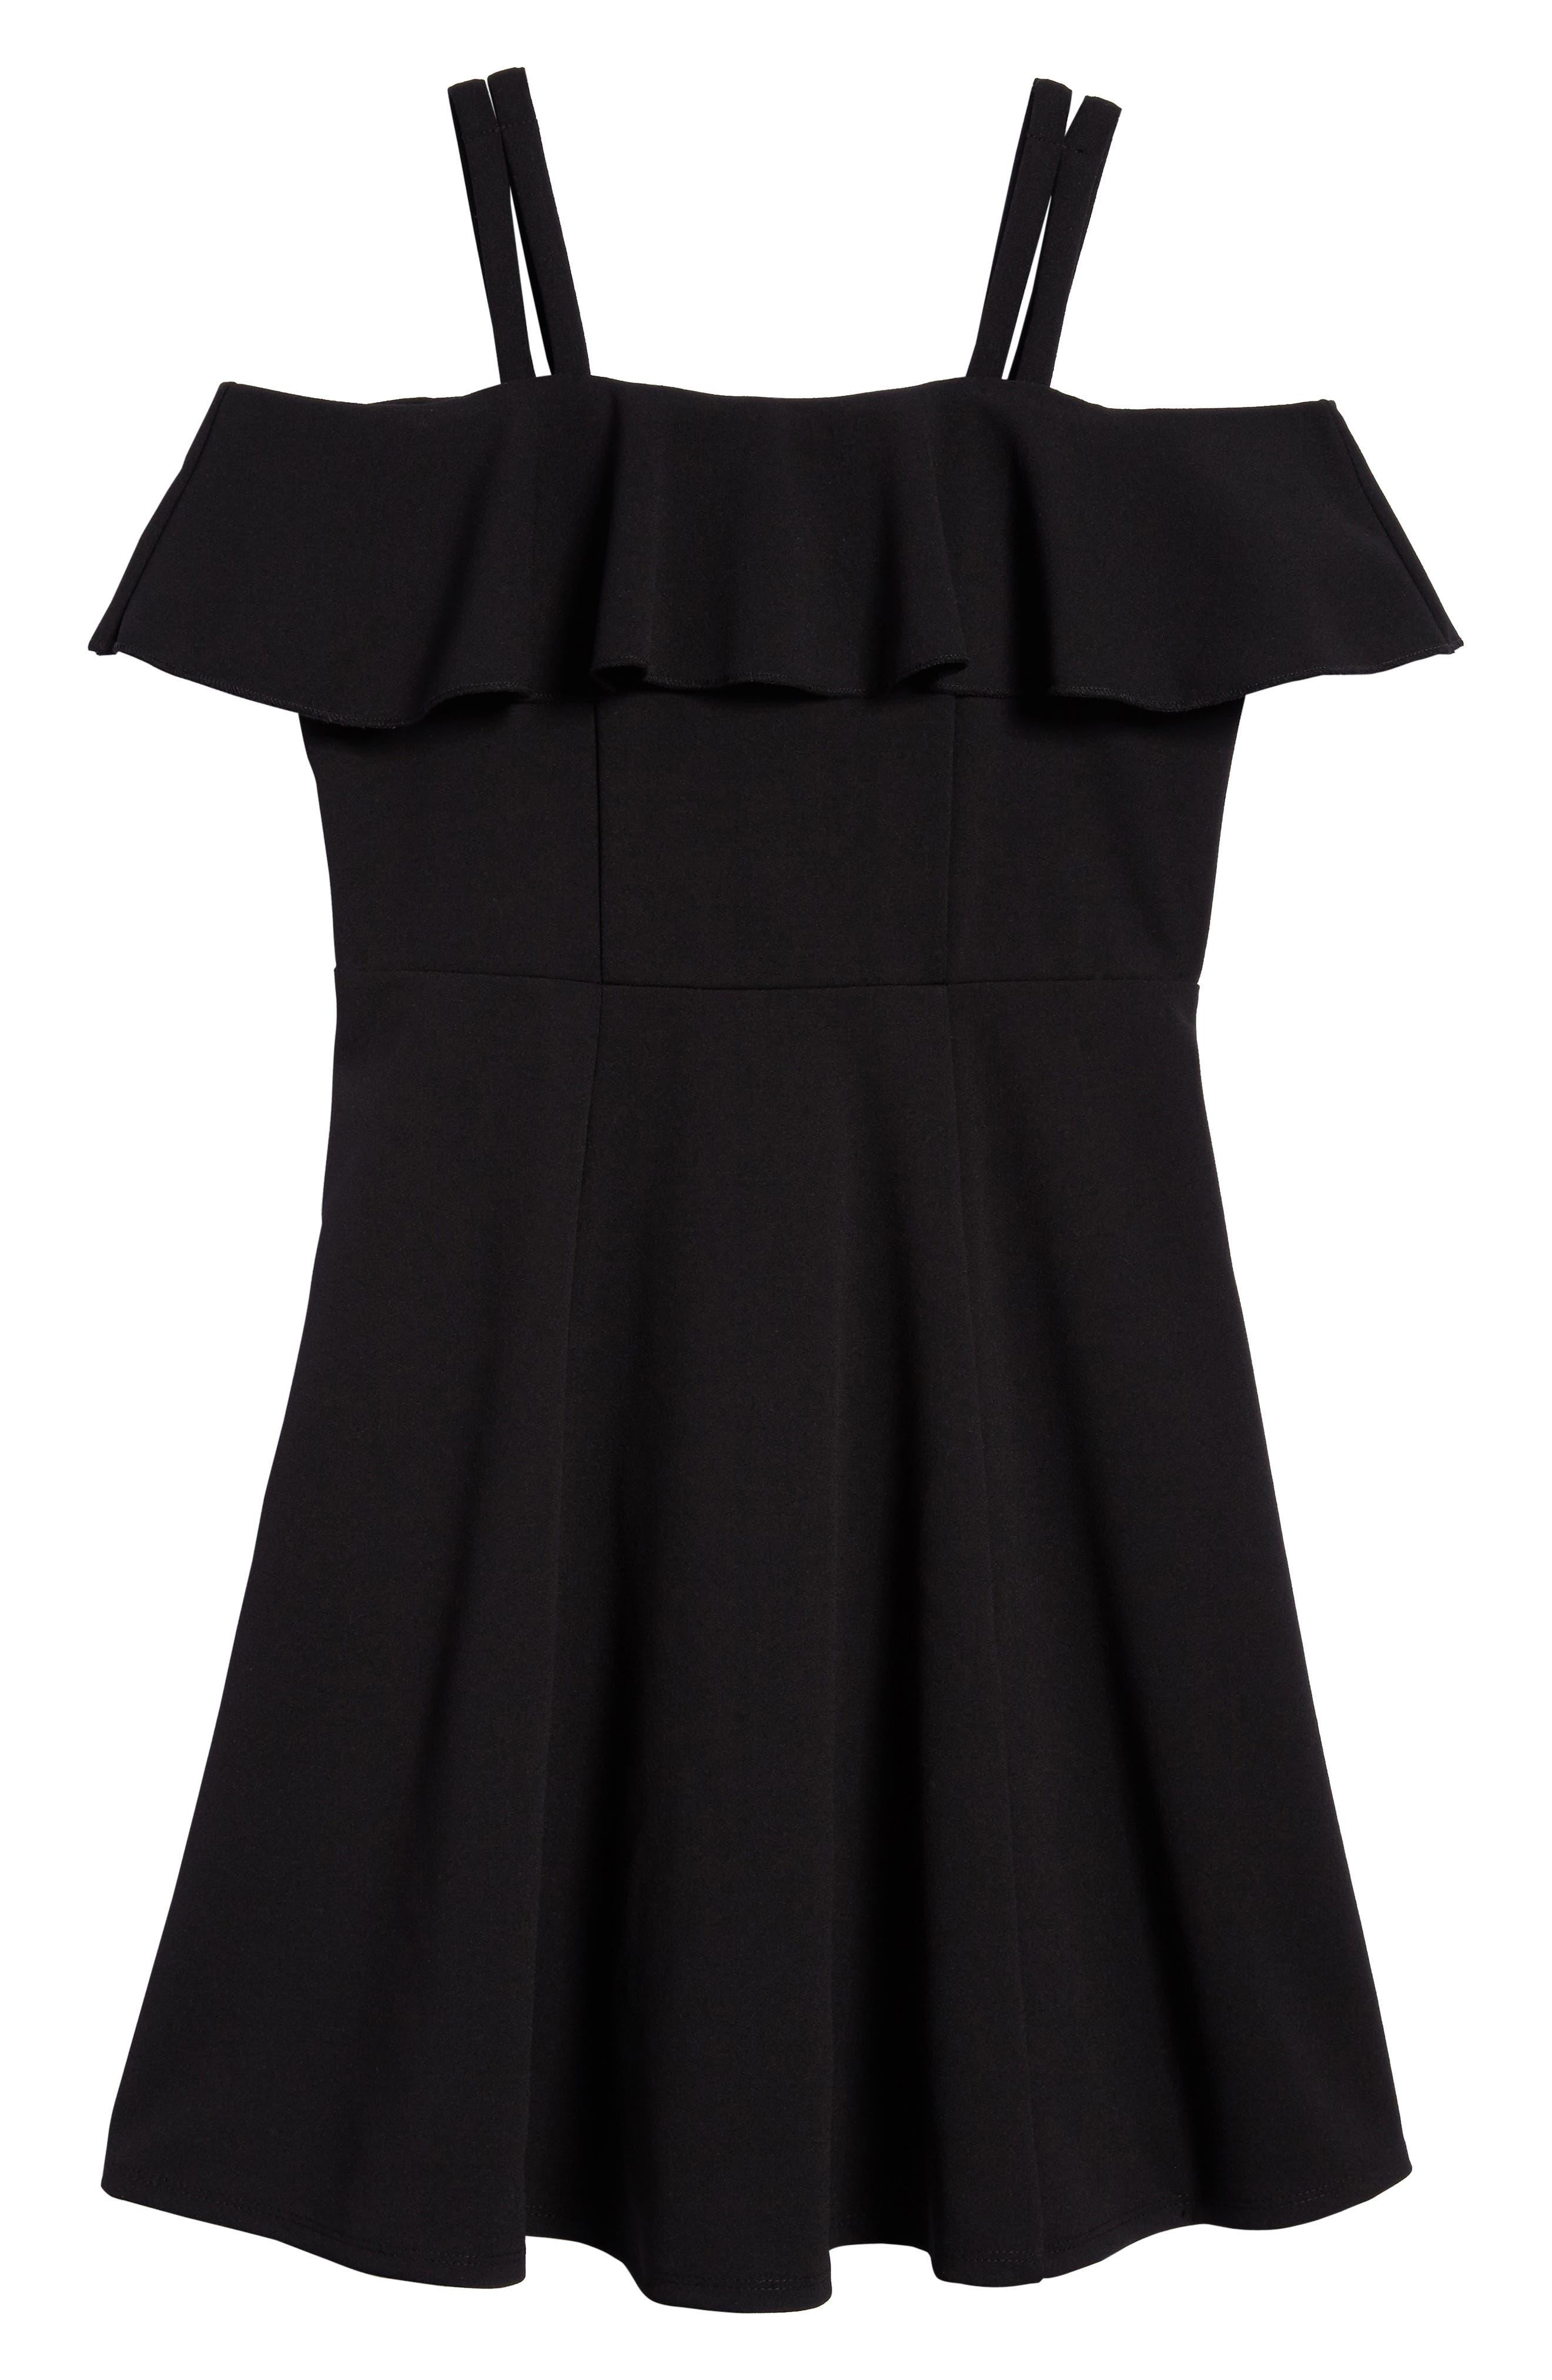 Main Image - Love, Nickie Lew Off the Shoulder Ruffle Dress (Big Girls)